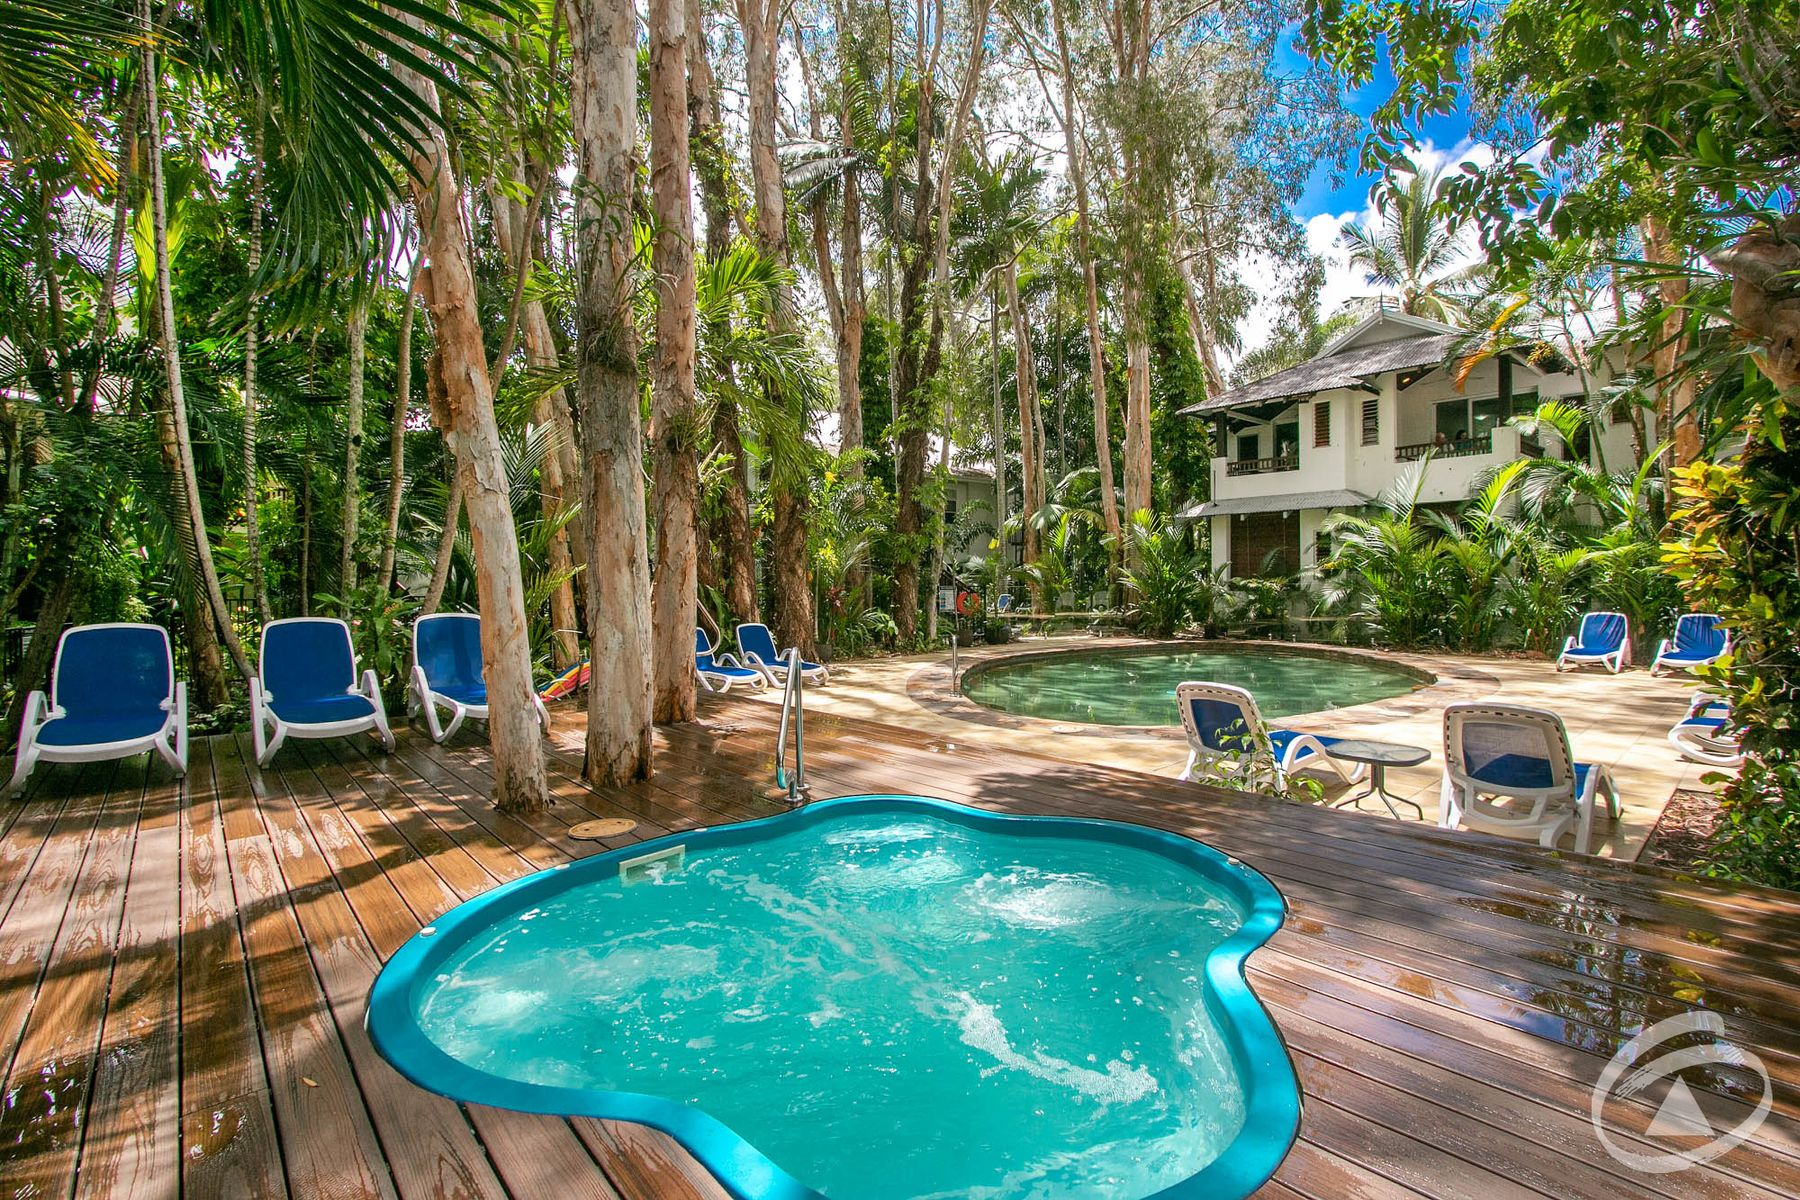 33/10-14 Amphora Street, Palm Cove, QLD 4879